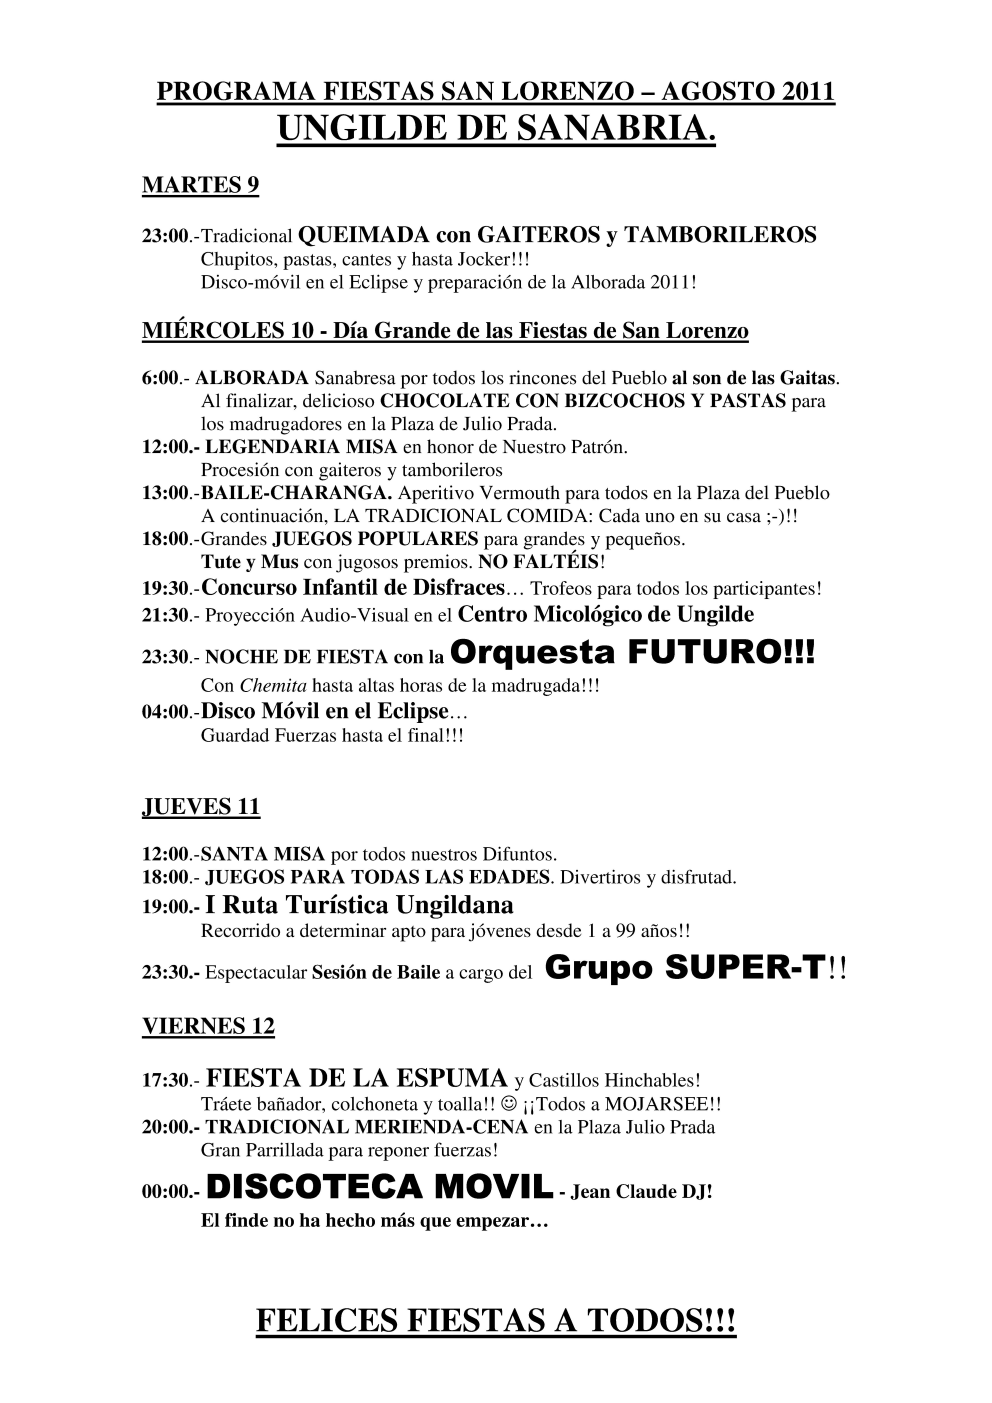 Programa fiestas Ungilde 2011